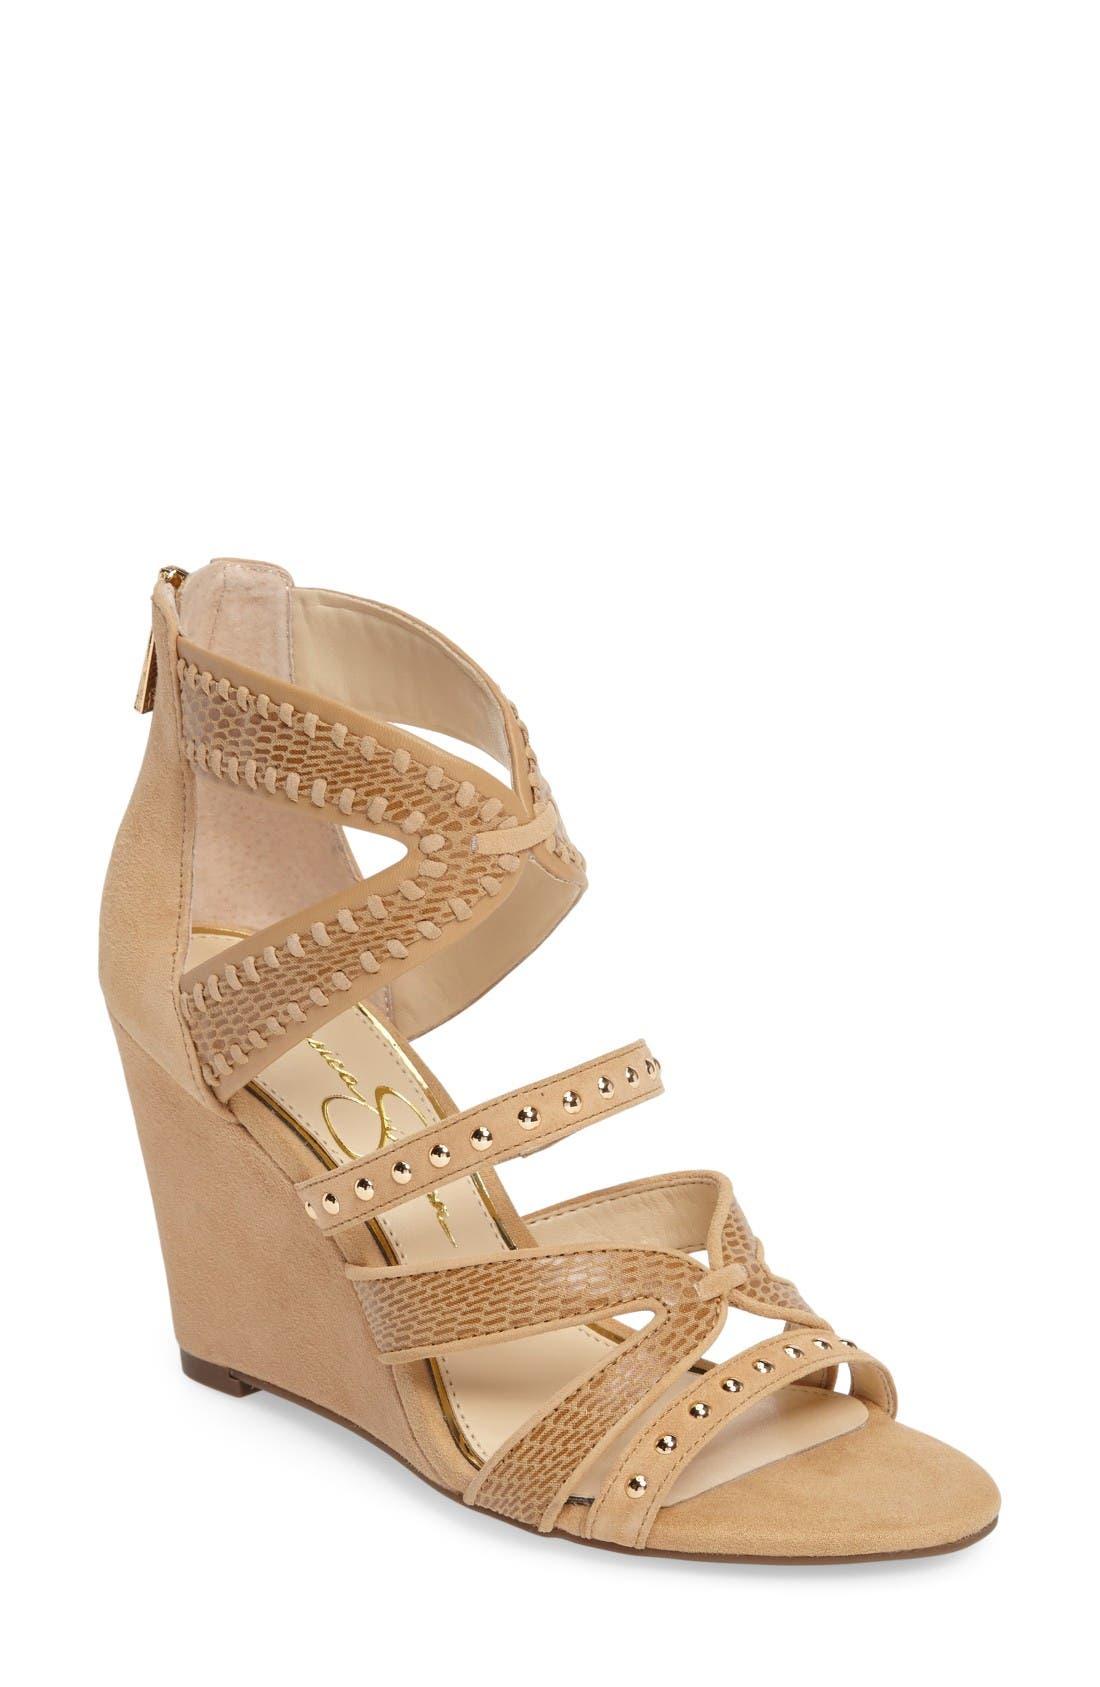 Jessica Simpson Zenolia Strappy Embellished Wedge (Women)